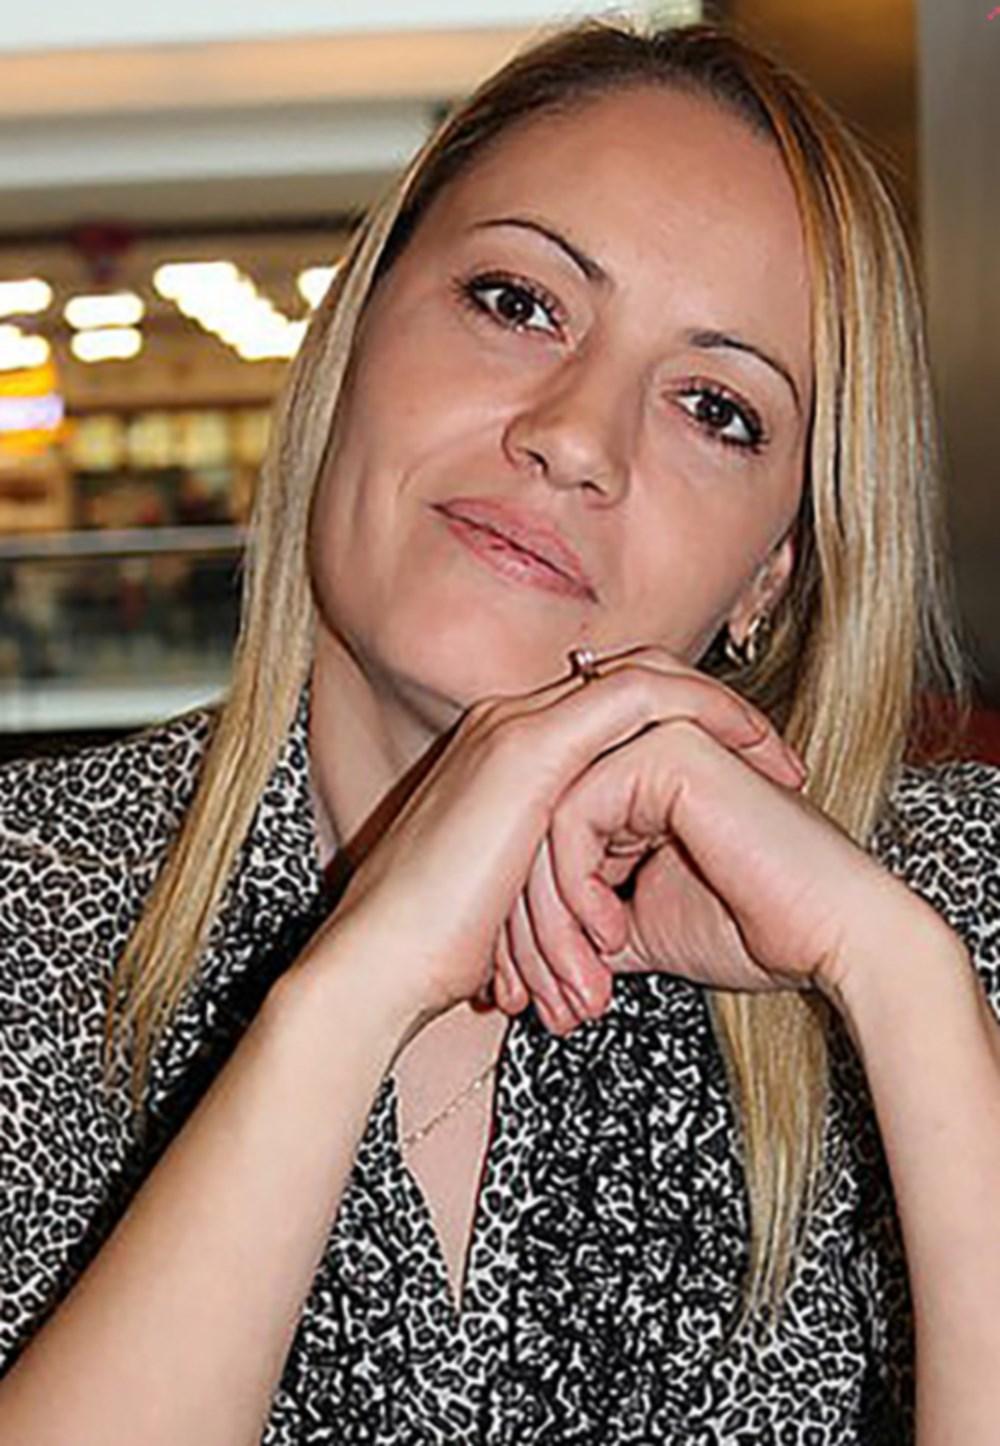 Fenomen Anna Leikovic annesini öldürdü - 7